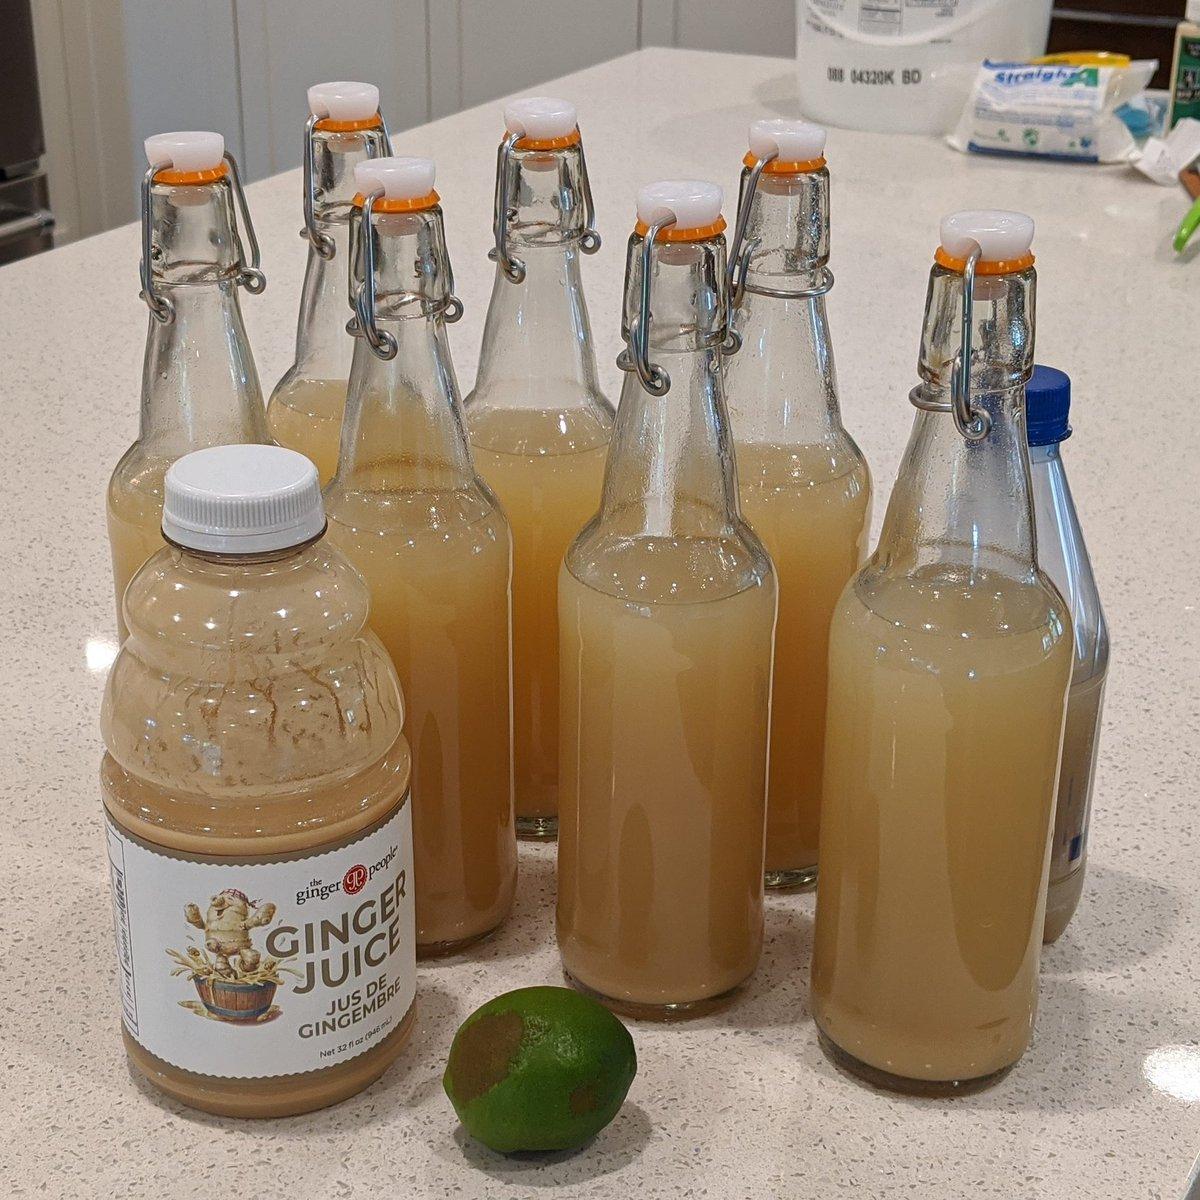 v3 Brown Paper Bag. Less ginger, less lime. Ginger People ginger juice instead of freshly juiced ginger. Pre-ferment tasted really nice, gentle but still a bit of a bite. Now I have to wait 48 hours  #gingerbeer pic.twitter.com/zoshnoYt5G